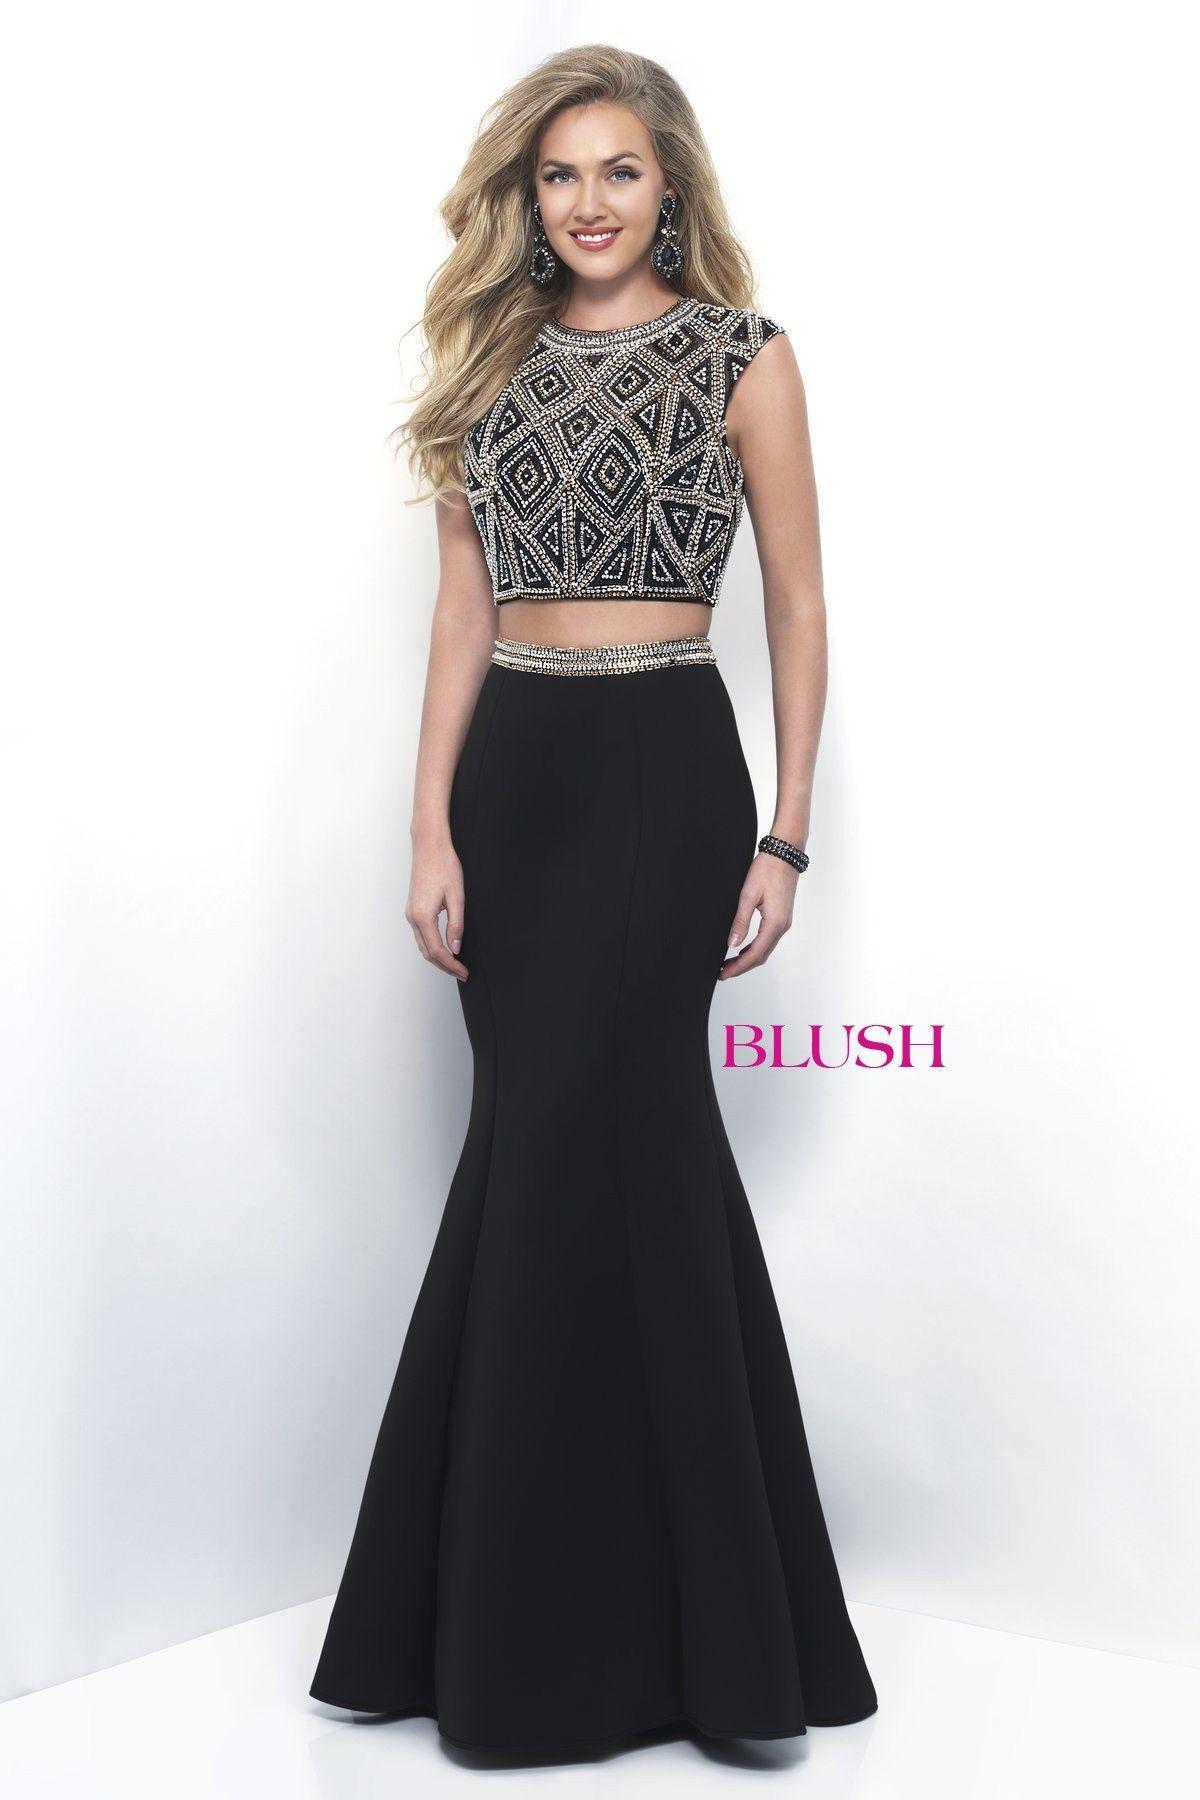 Blush prom black twopiece prom dress gimme a reason